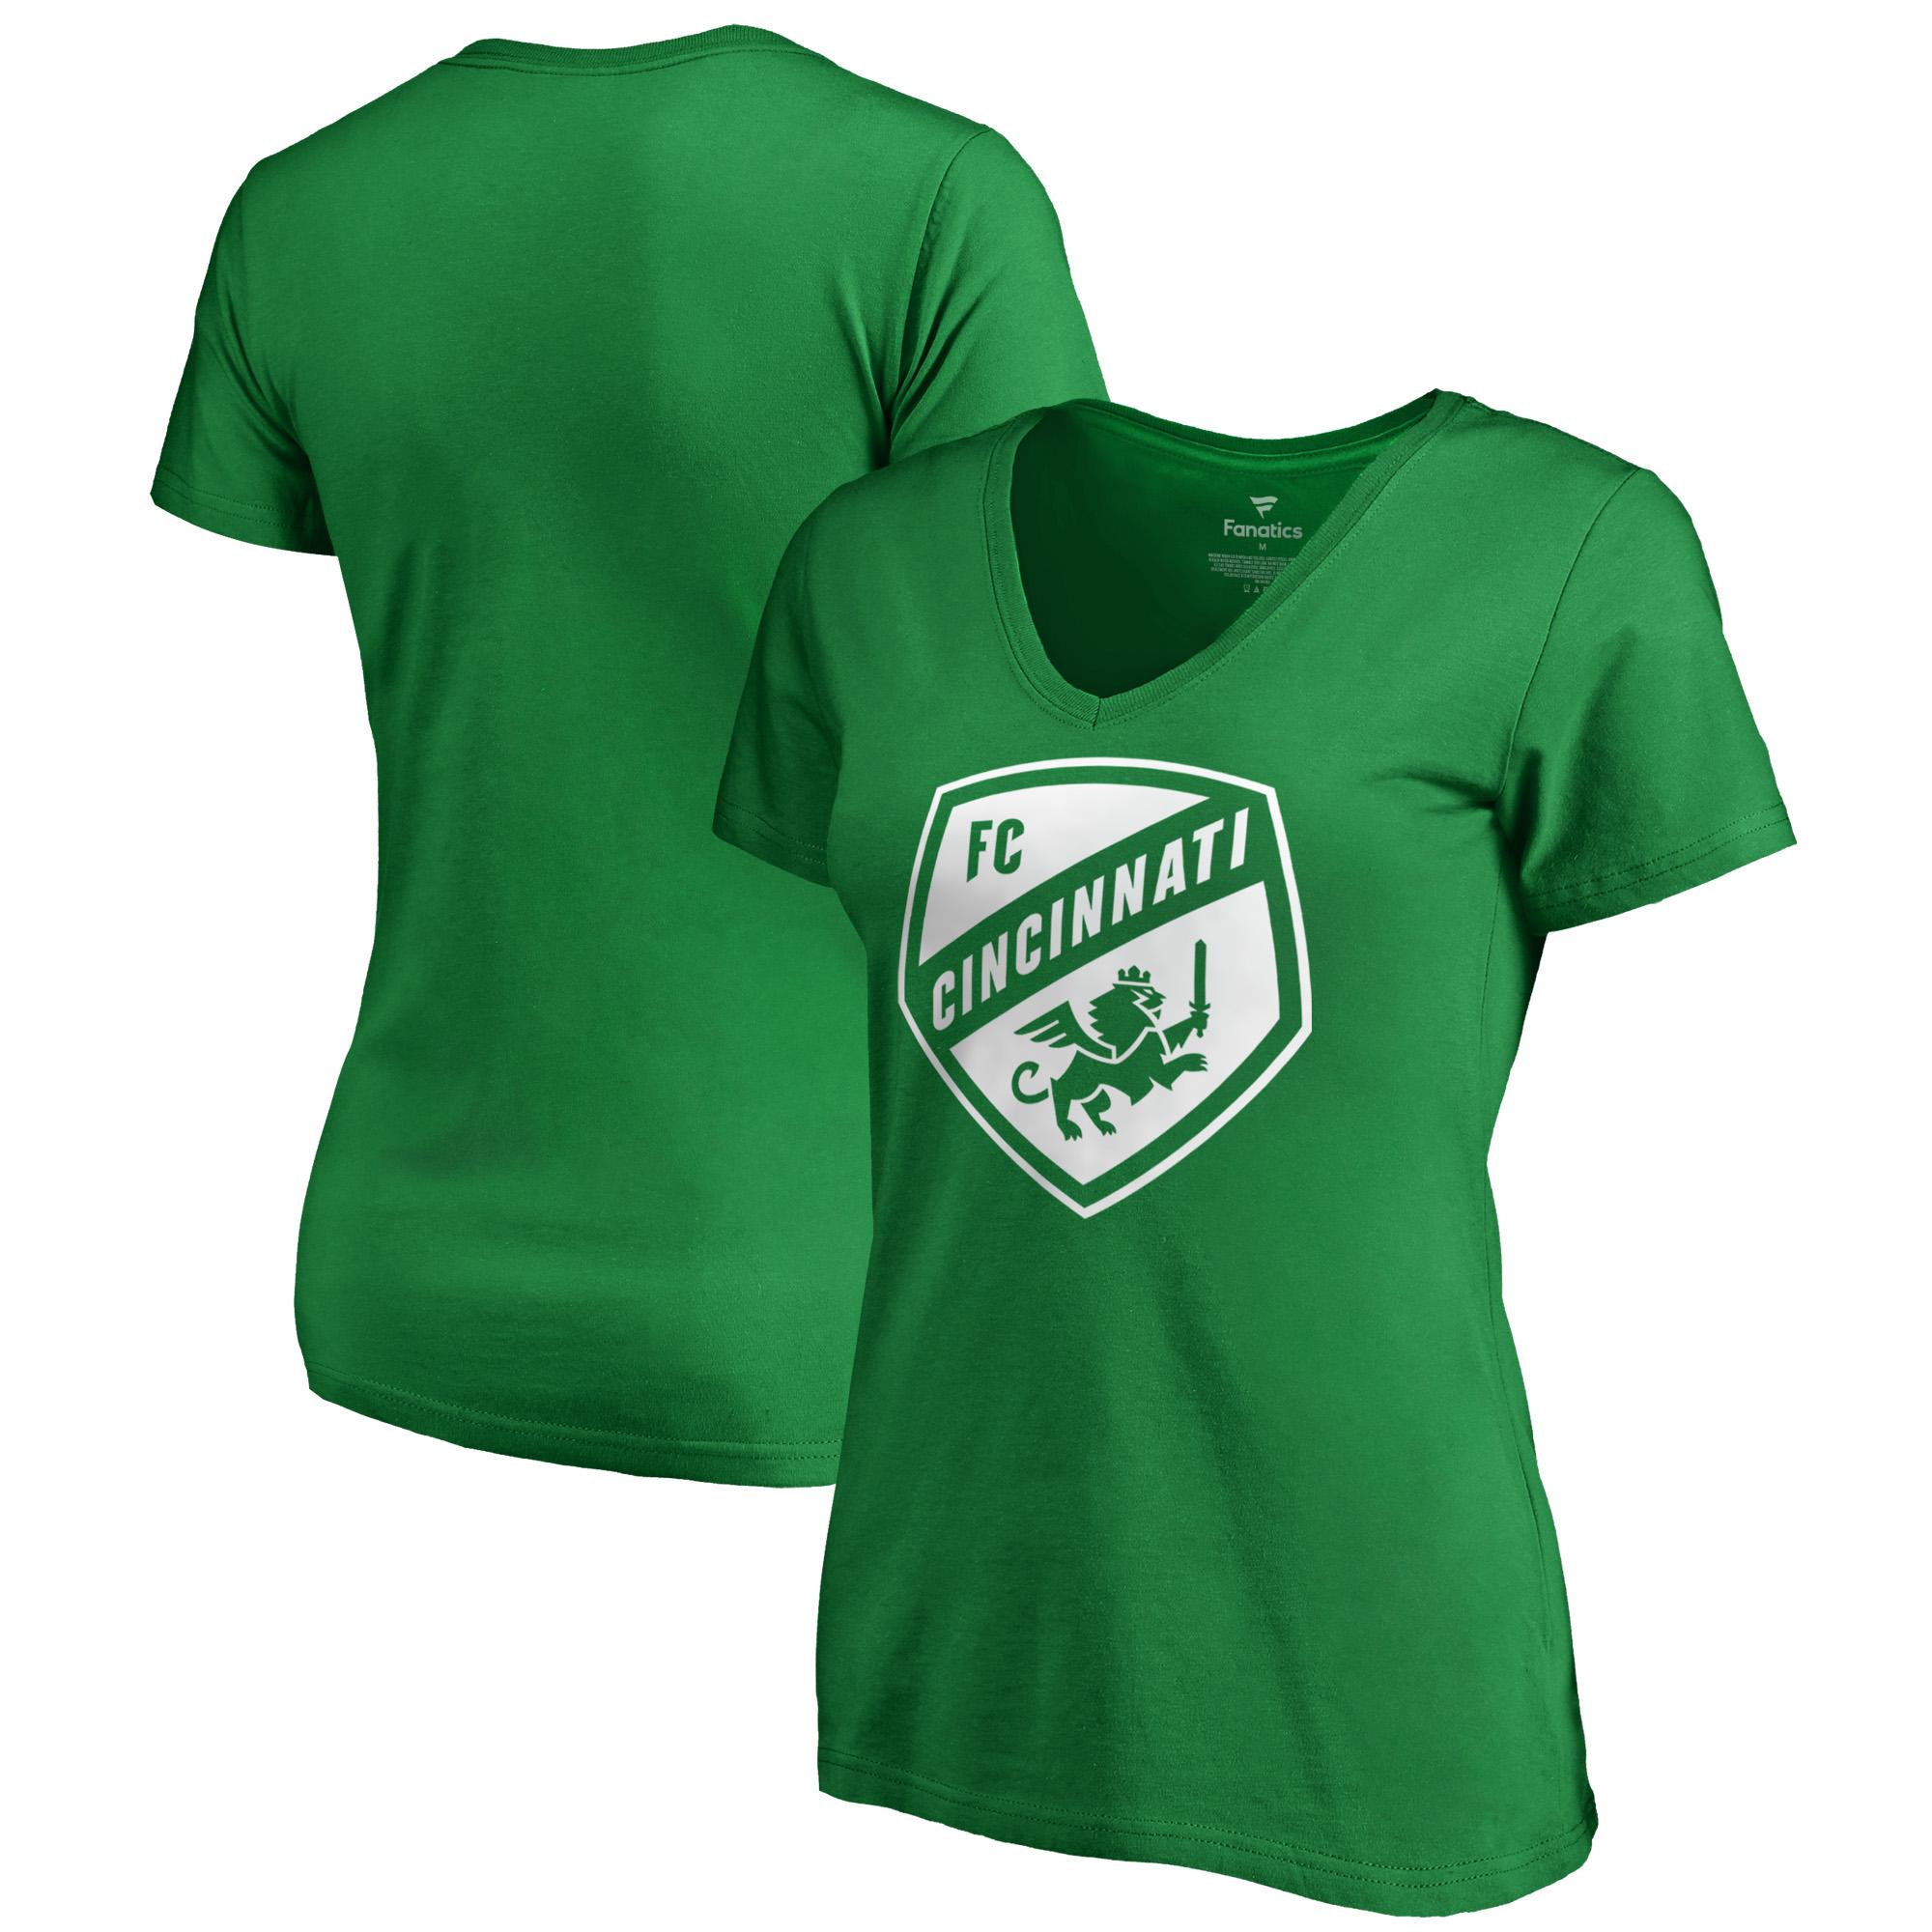 FC Cincinnati Fanatics Branded Women's Plus Size St. Patrick's White Logo V-Neck T-Shirt - Kelly Green